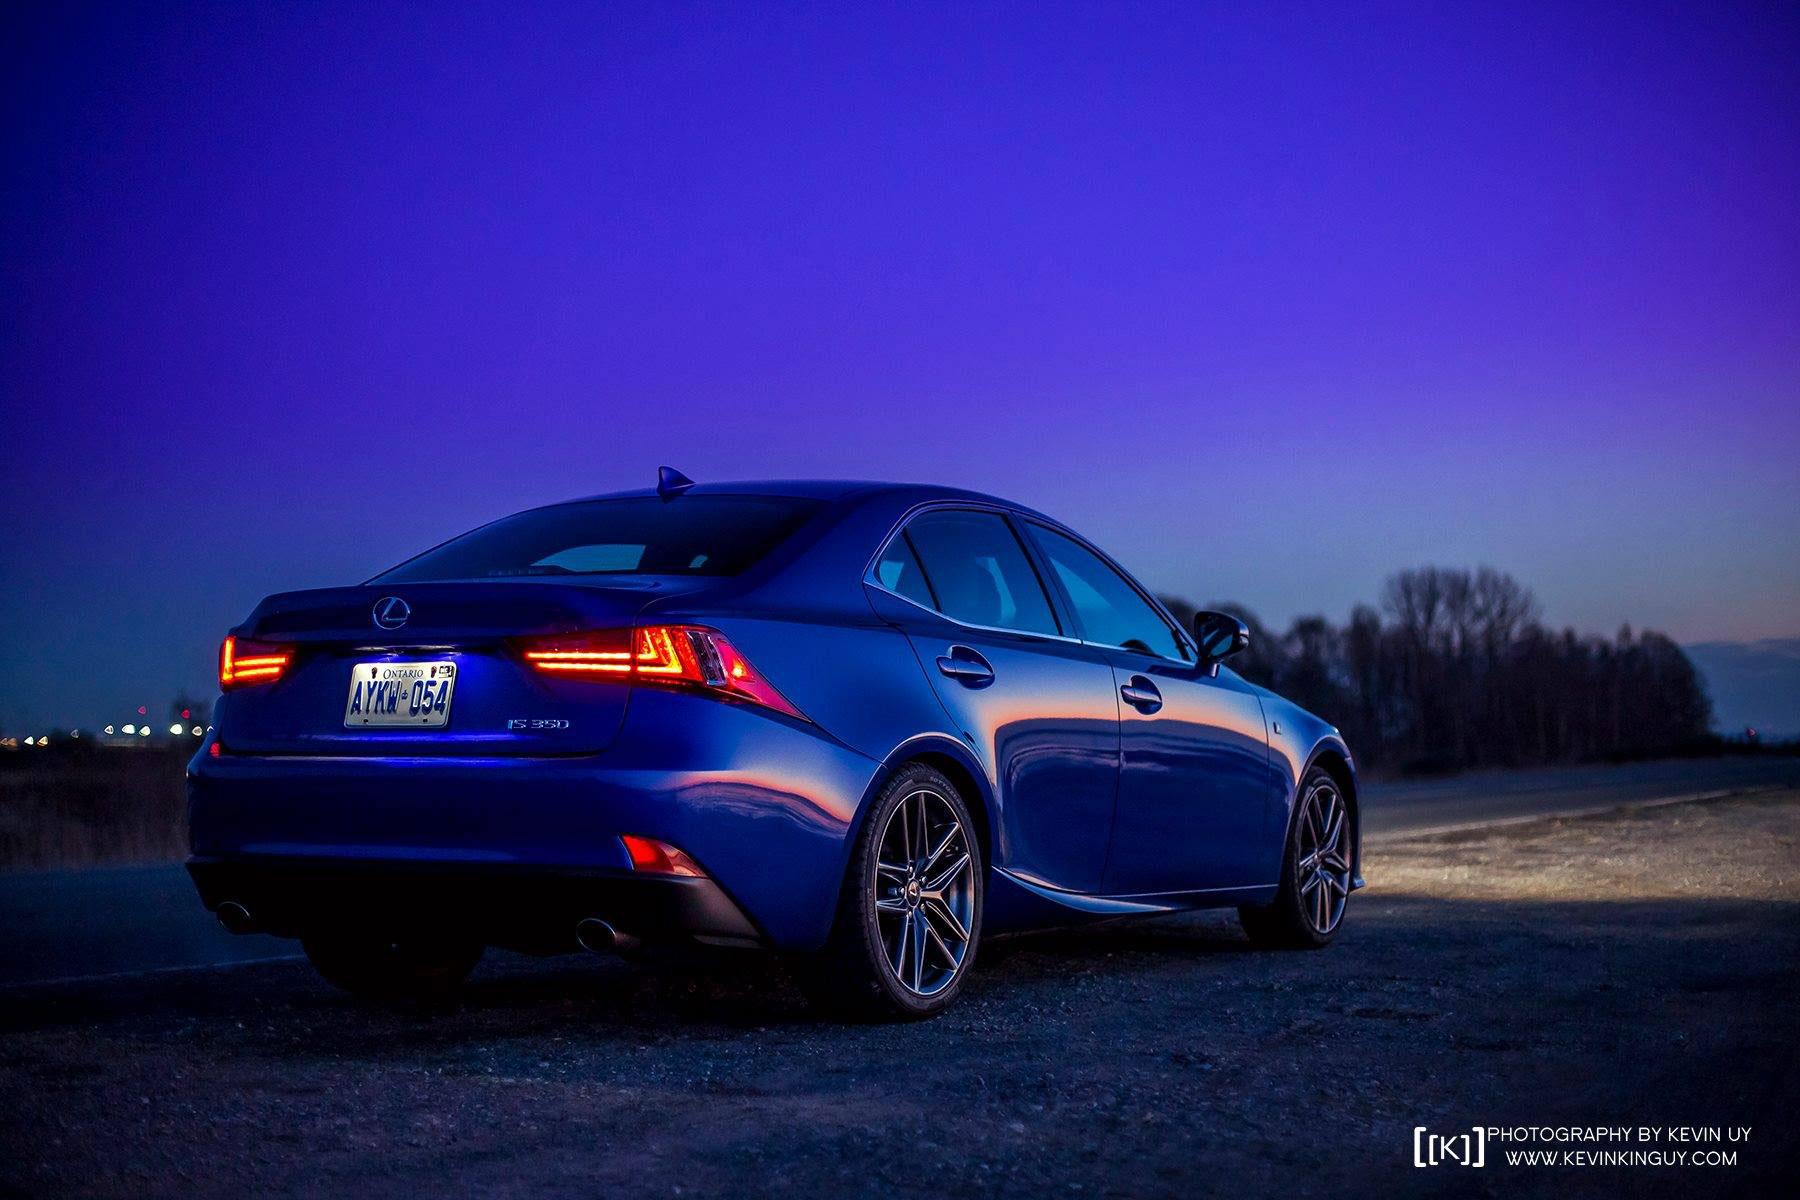 Toyota Land Cruiser Hd Wallpaper Ultrasonic Blue Lexus Is F Sport At Dusk For Your Desktop